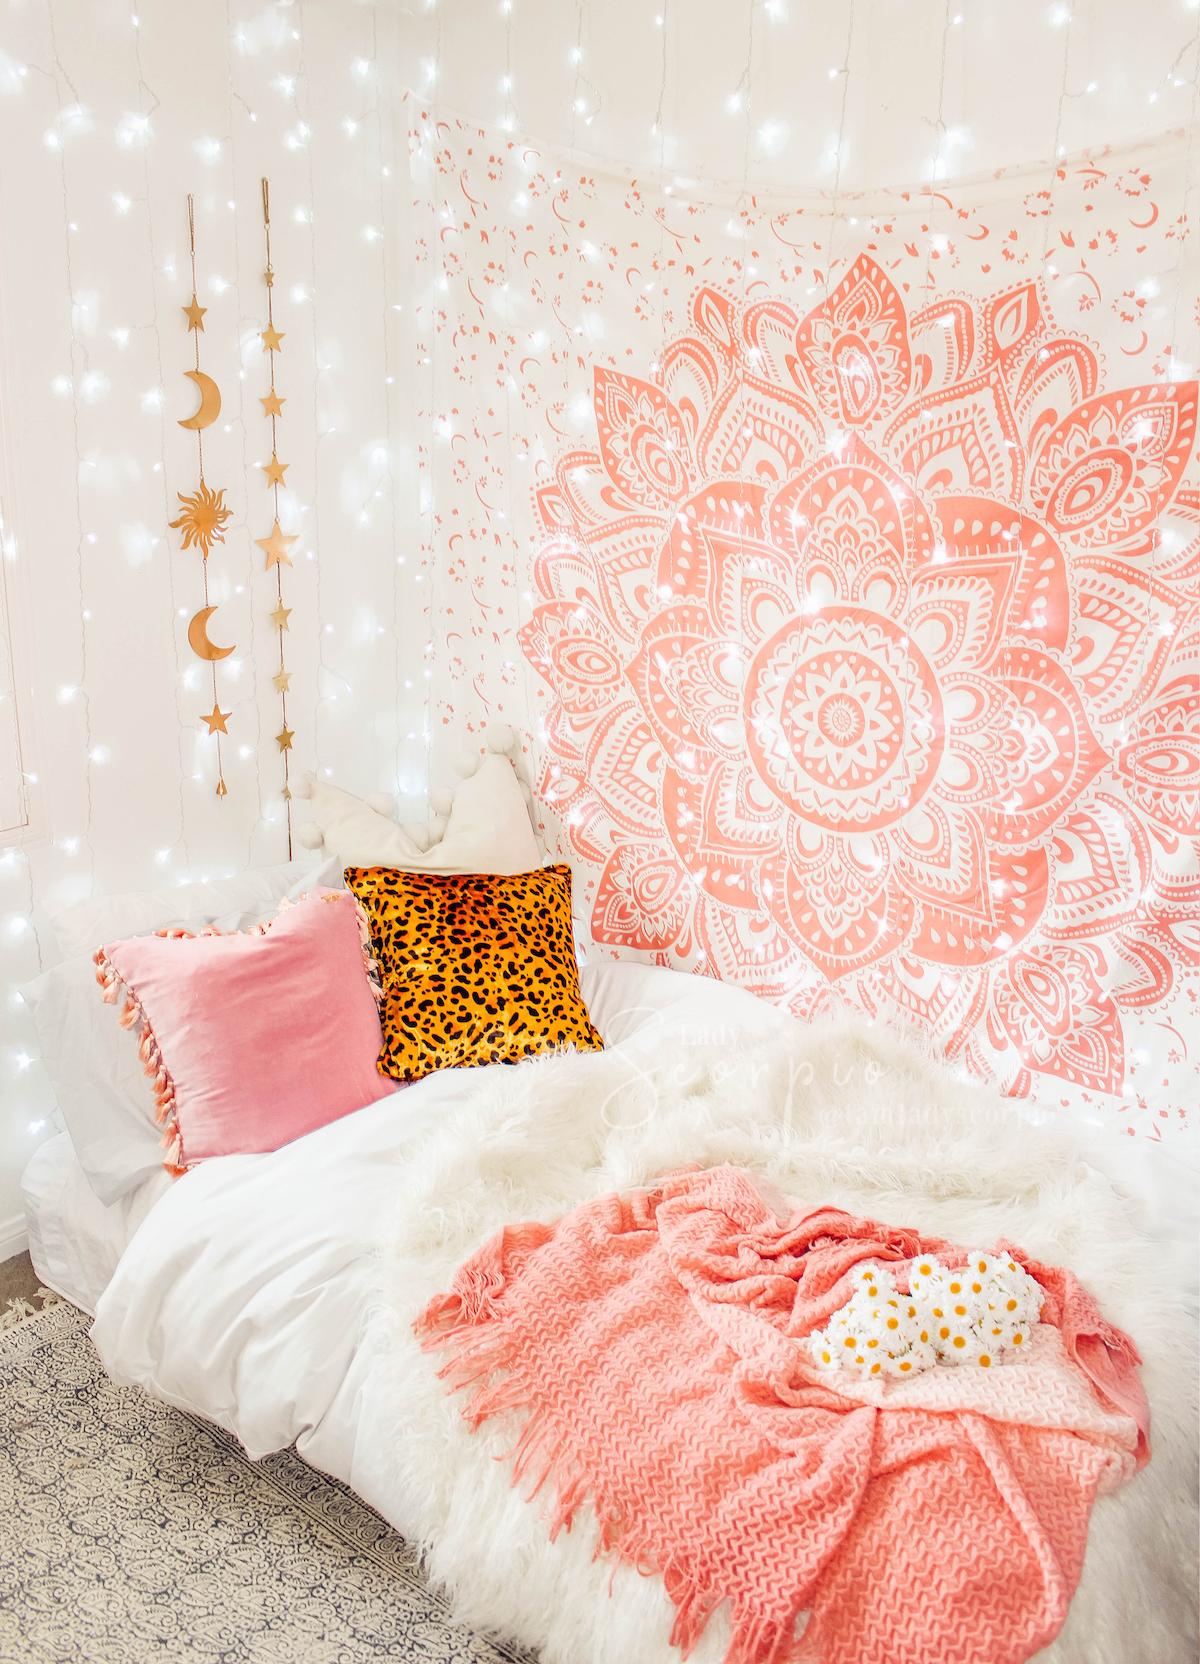 Blush Rose Mandala Tapestry images